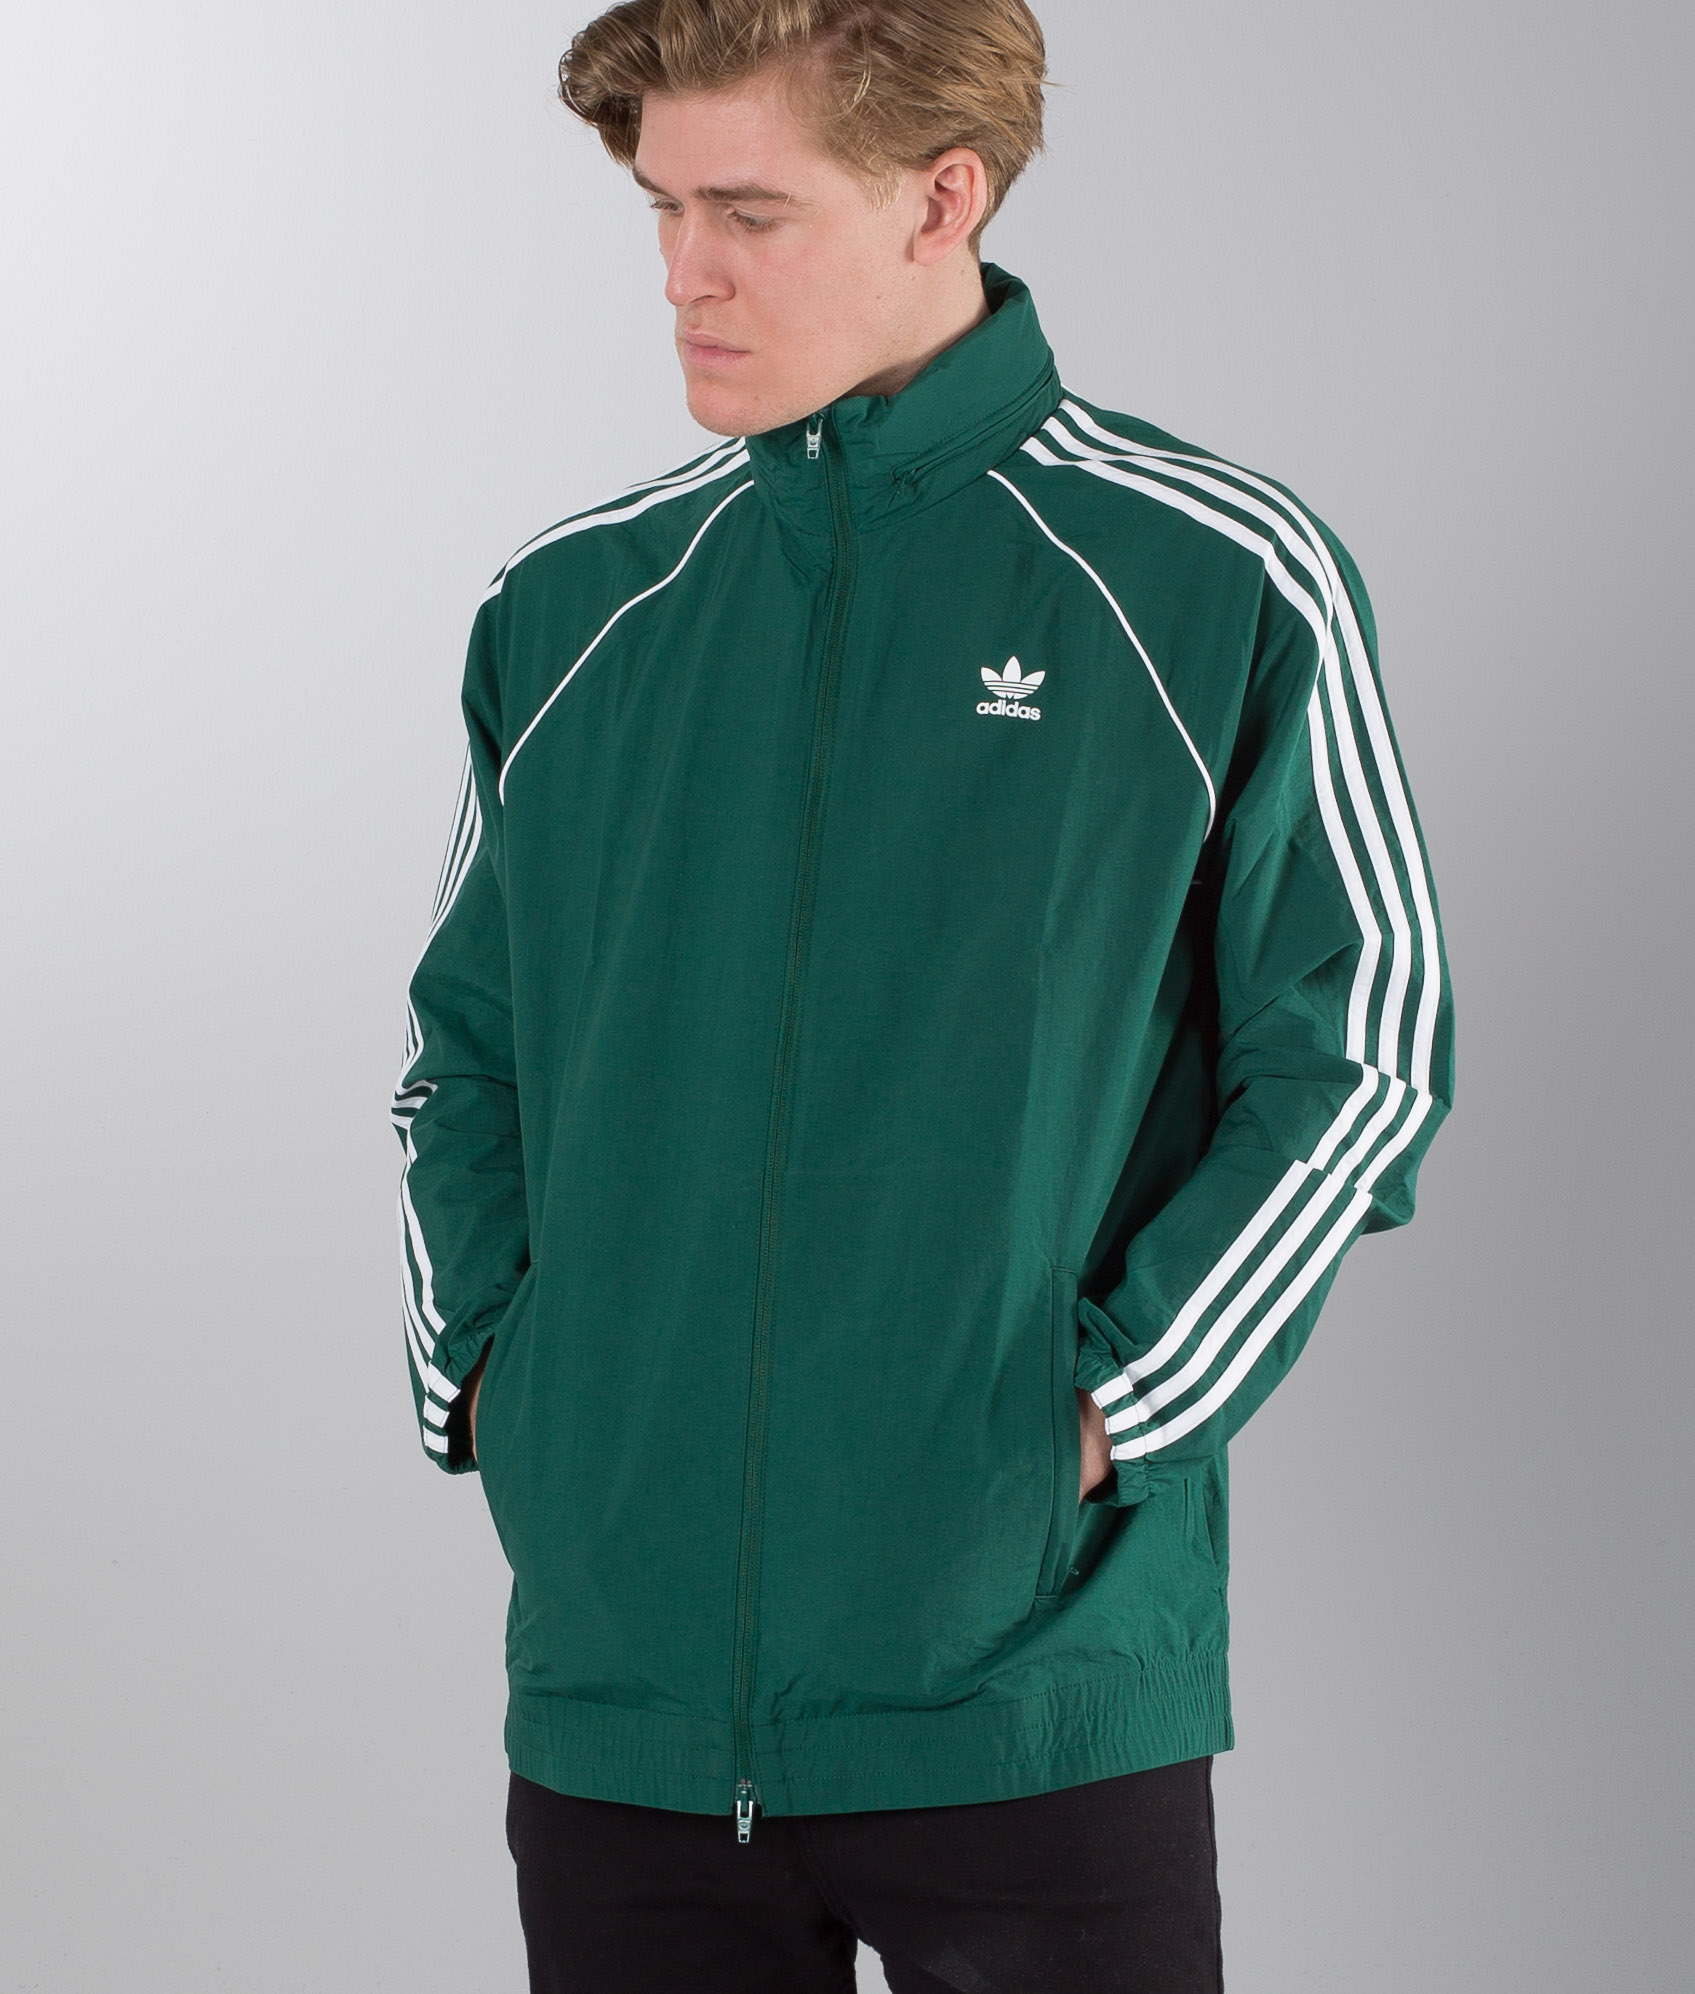 Collegiate Veste Adidas Green Originals Sst kZOXiuP